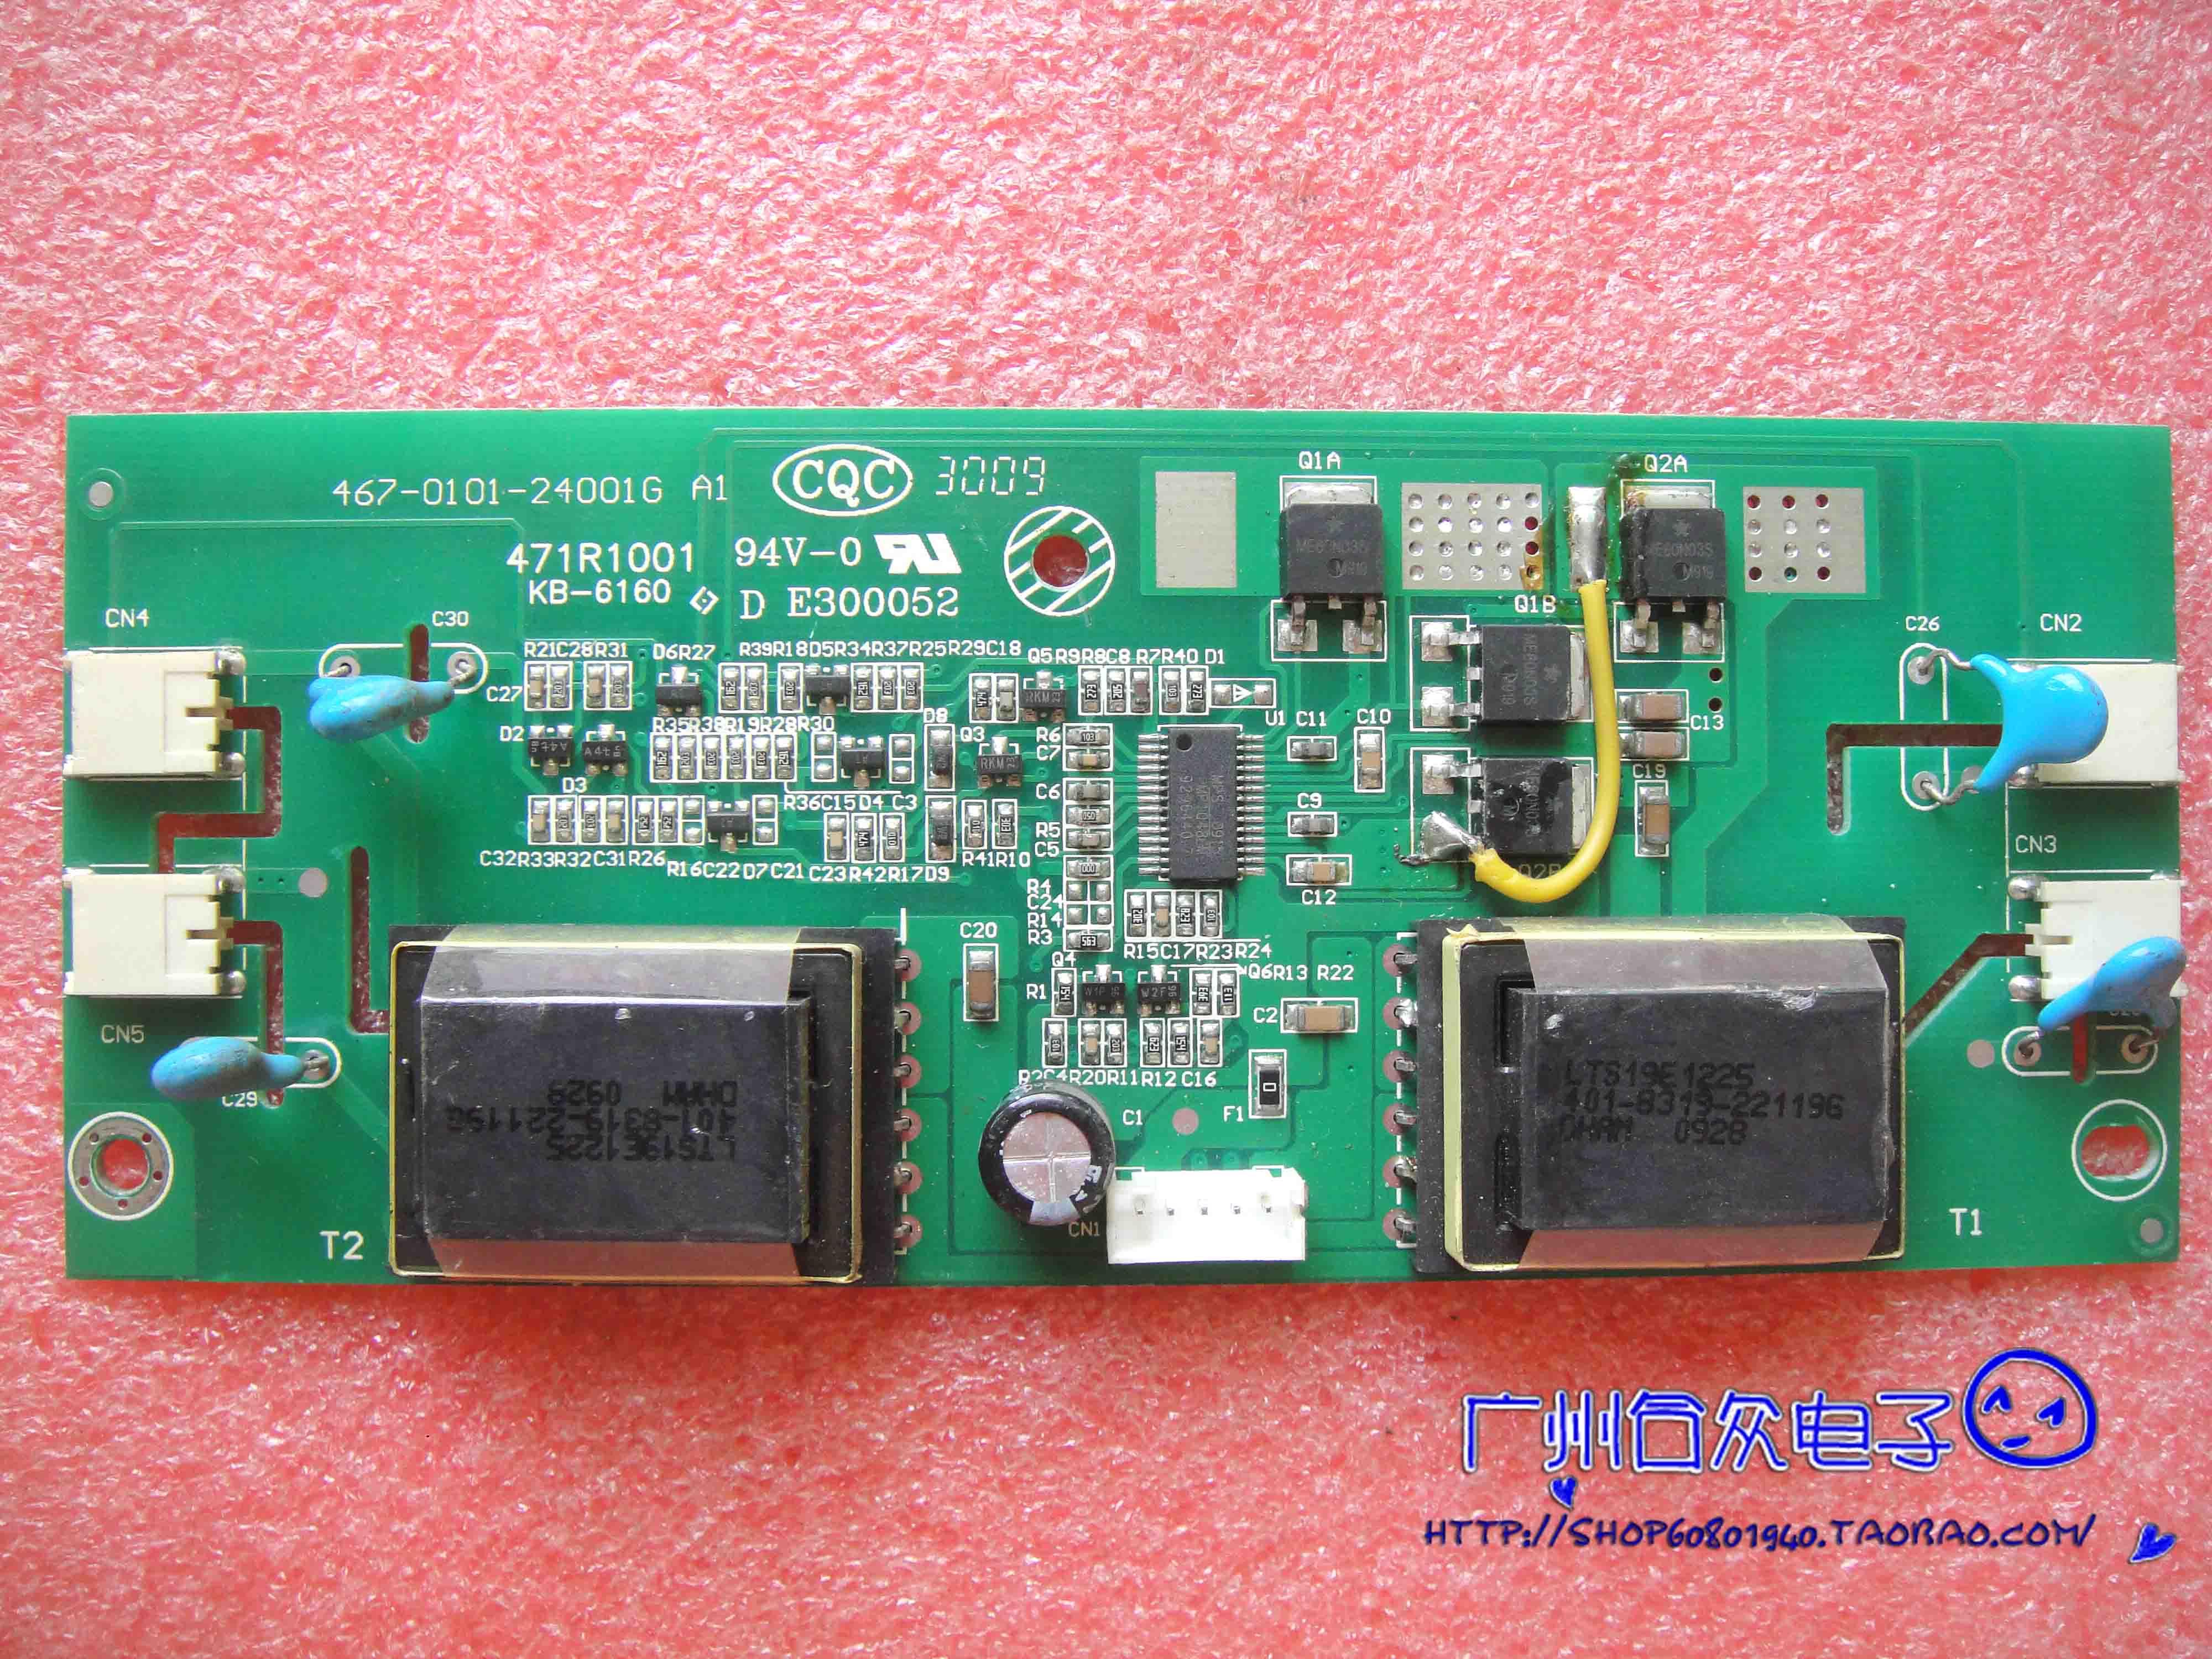 L23E09 L24E09 L24F09 placa de Alta pressão 467-0101-24001G 471R1006